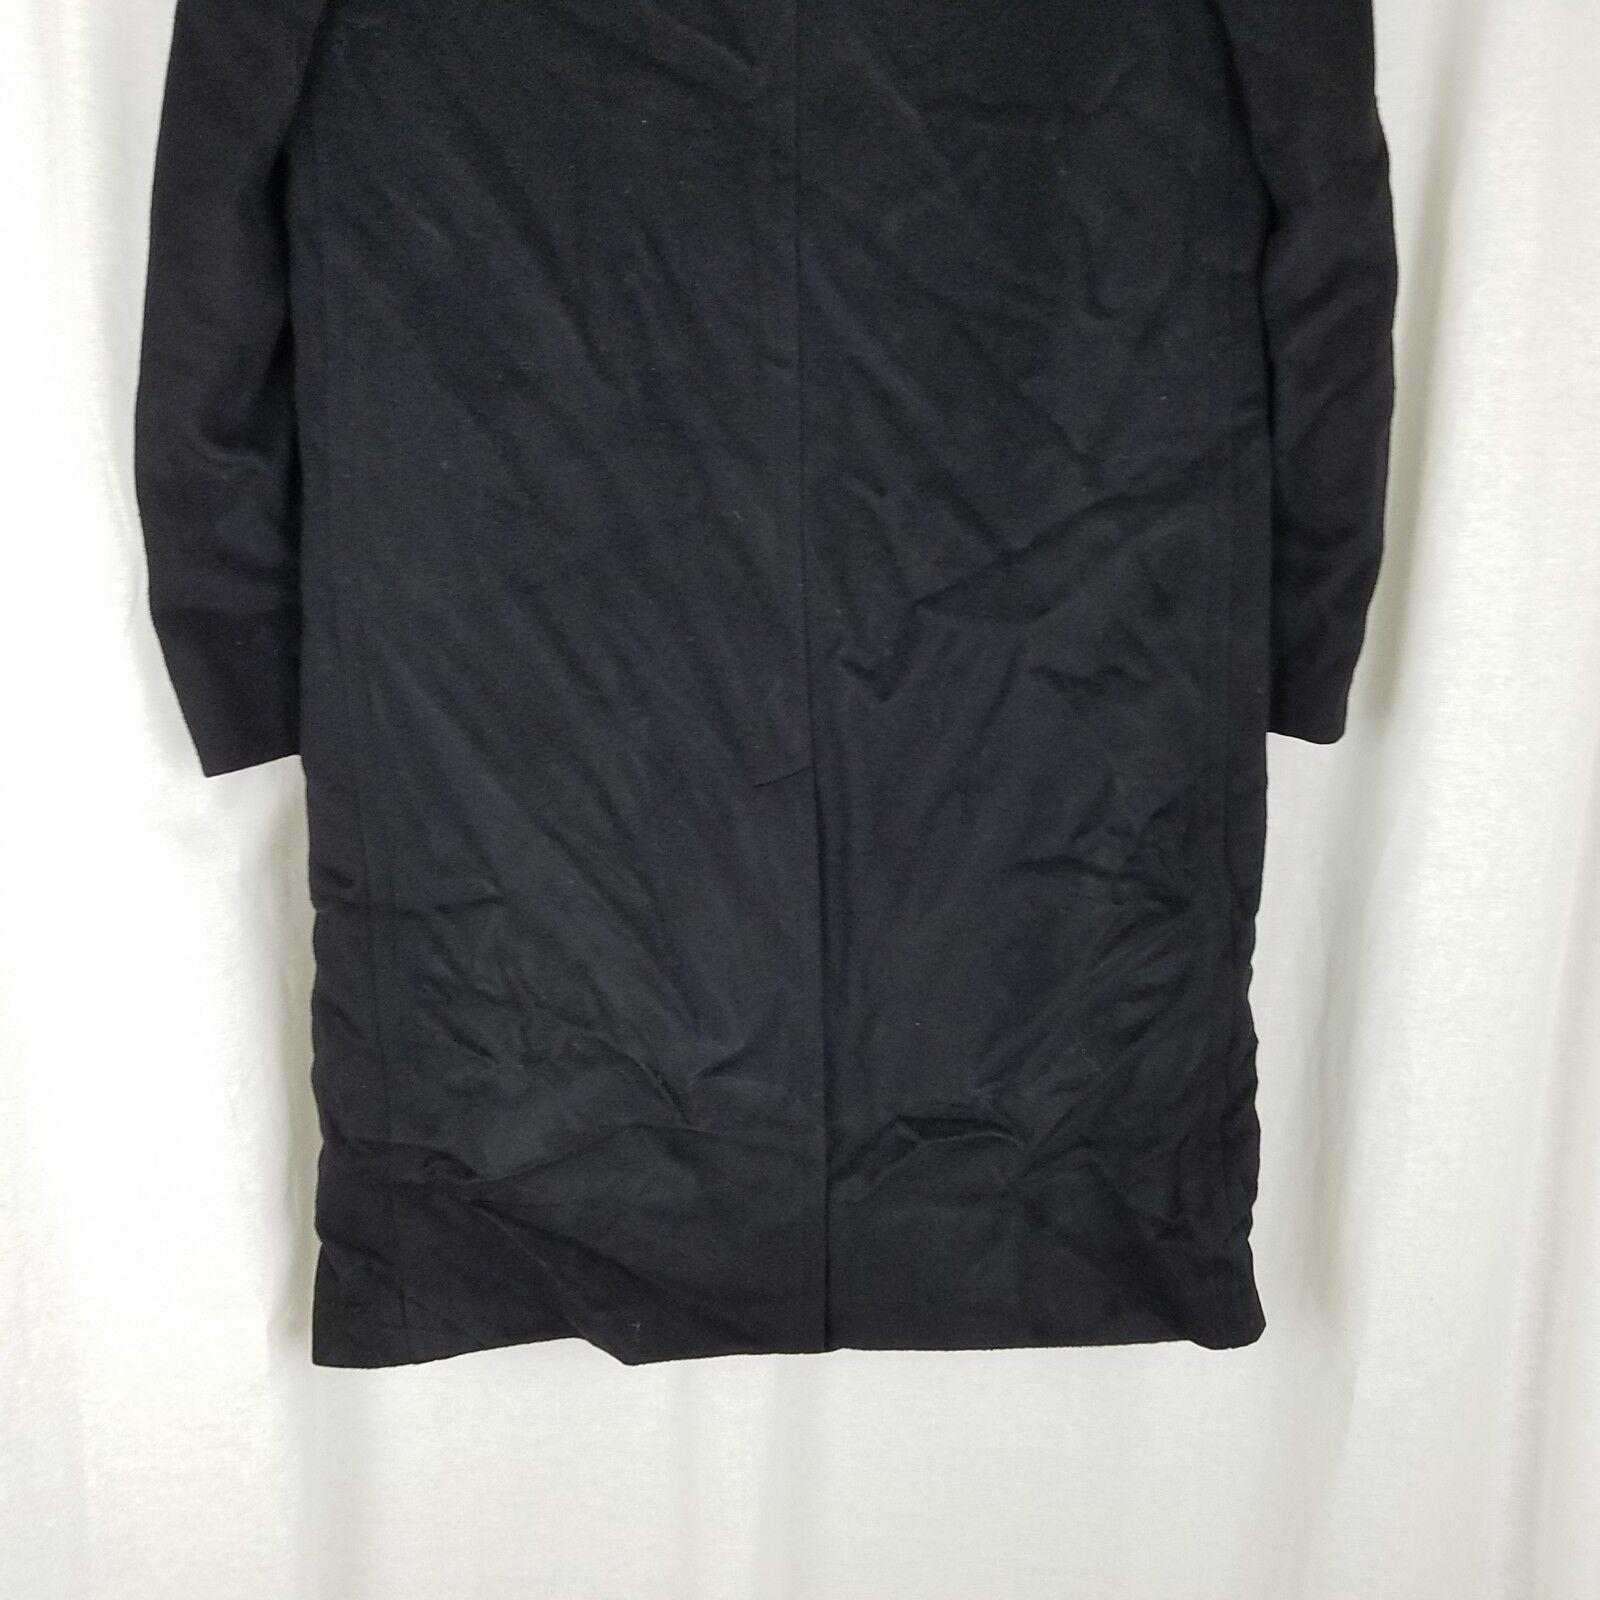 Vintage 100% Cashmere Puro Mongolo Cashmere 100% lungo Caban Lana Invernaleinverno Polo Giacca d4bad8